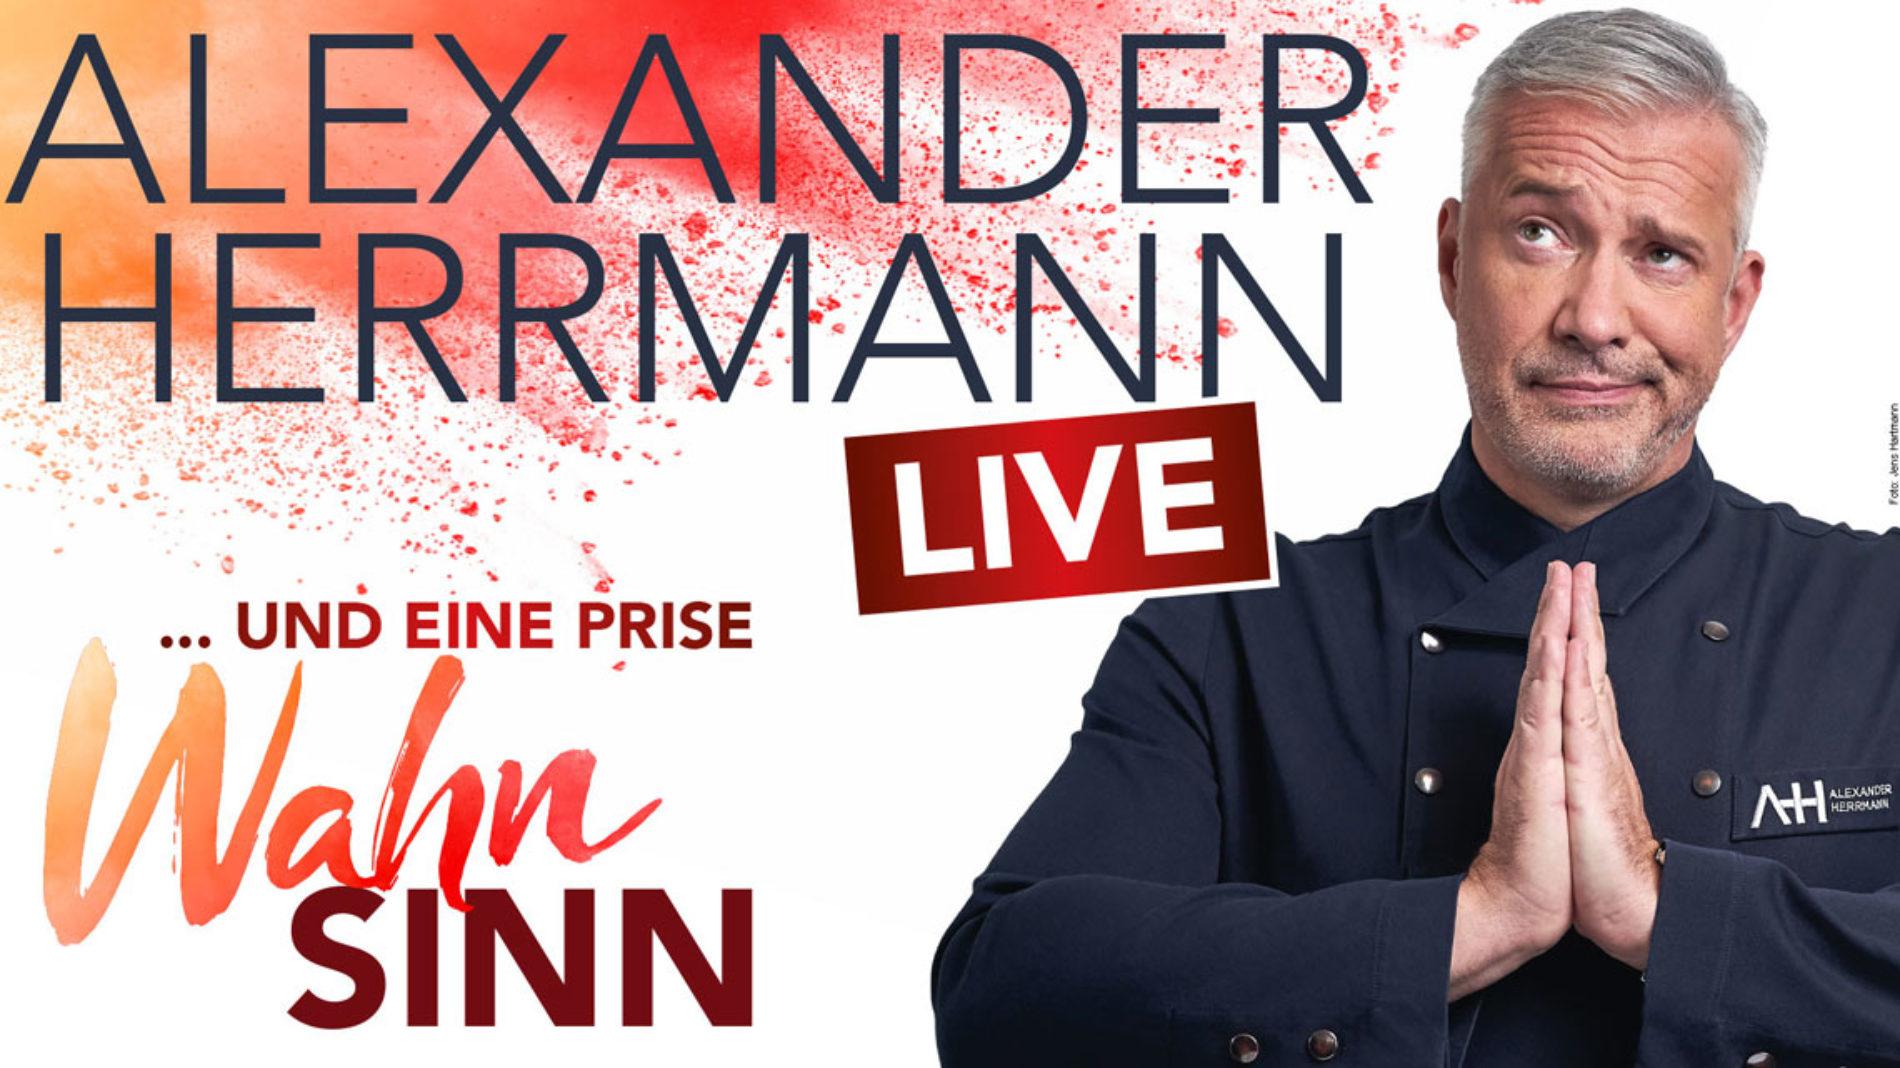 Alexander Herrrmann